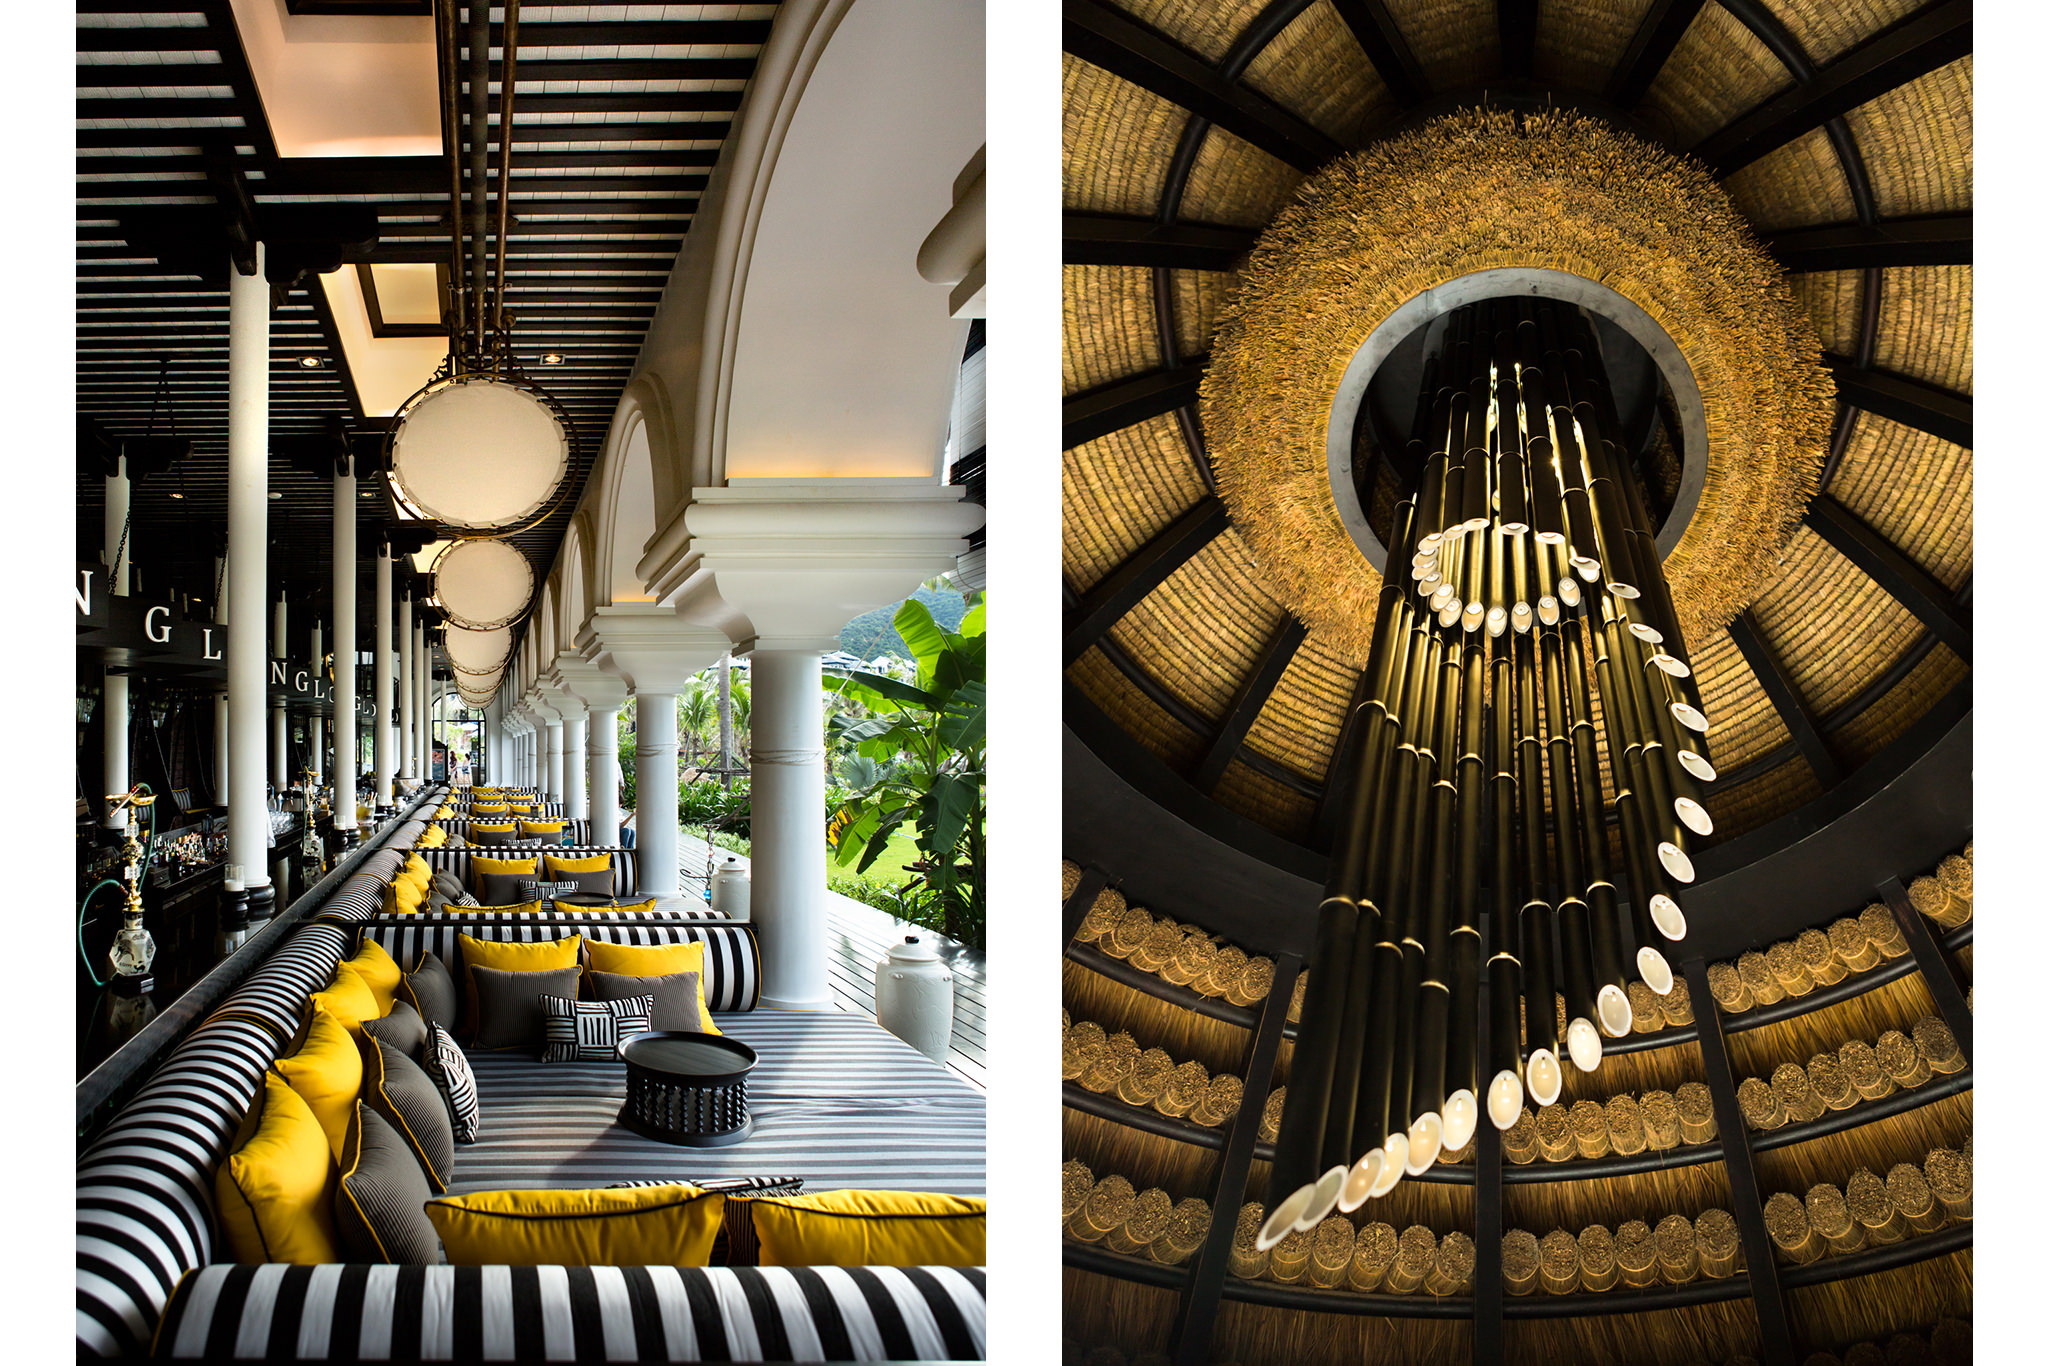 Vietnam Architecture Photographer - Ho Chi Minh City, Hanoi, Danang